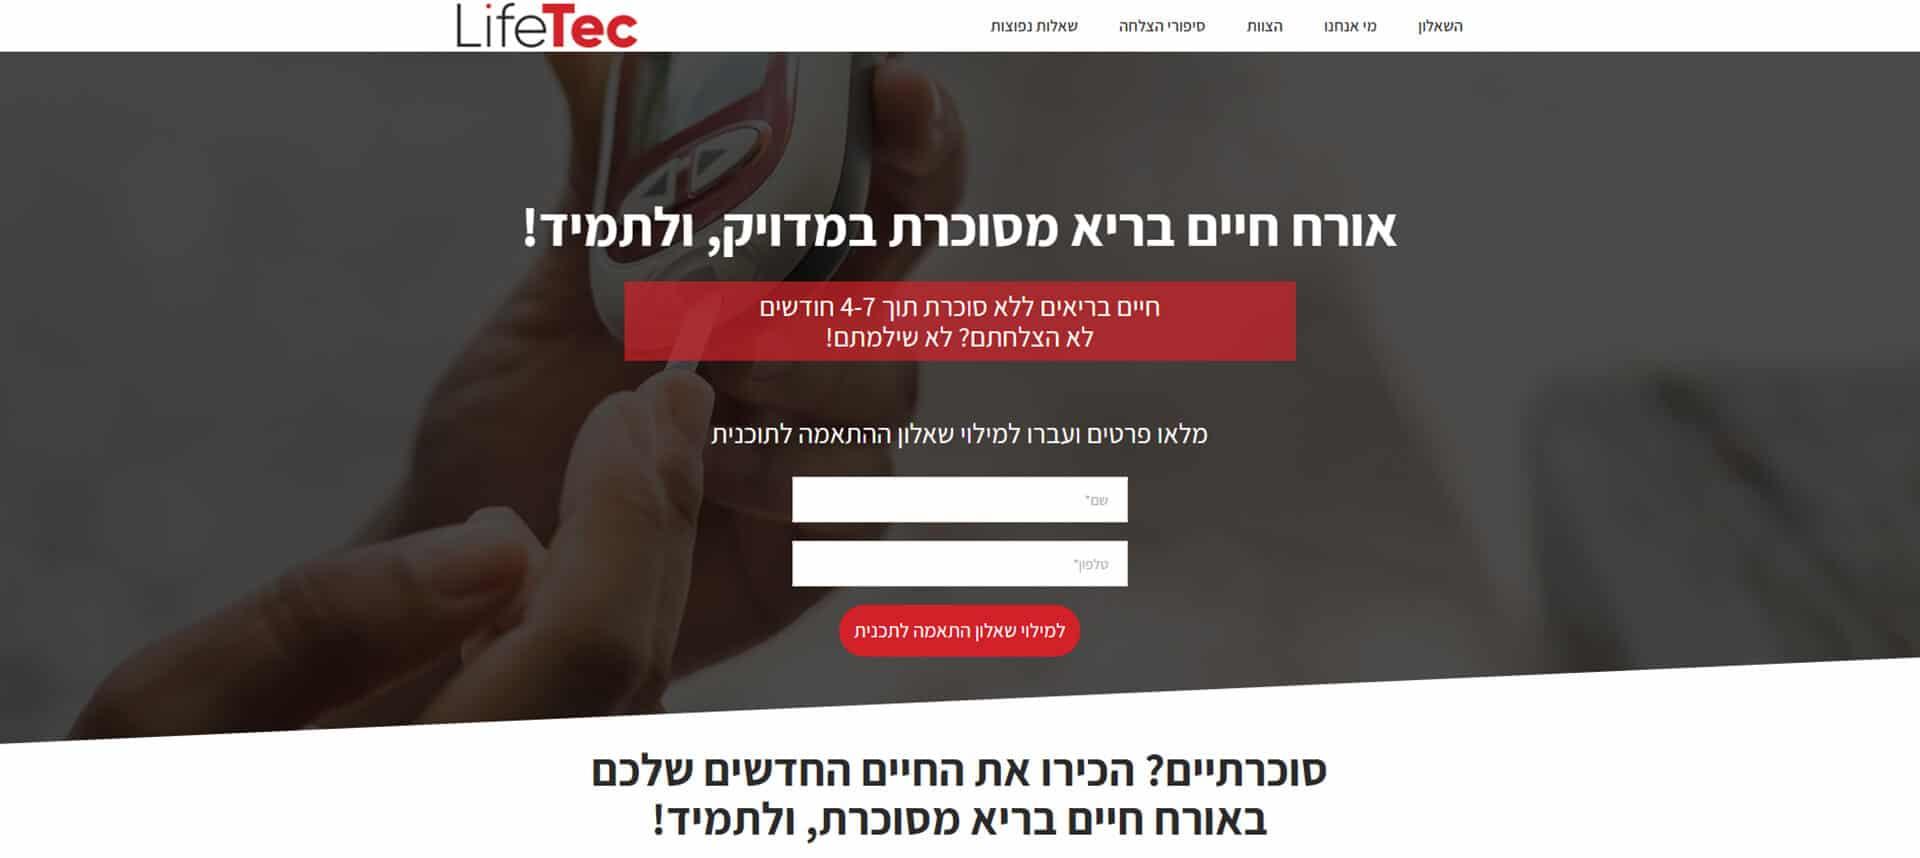 בניית אתר לLIFETECH_1